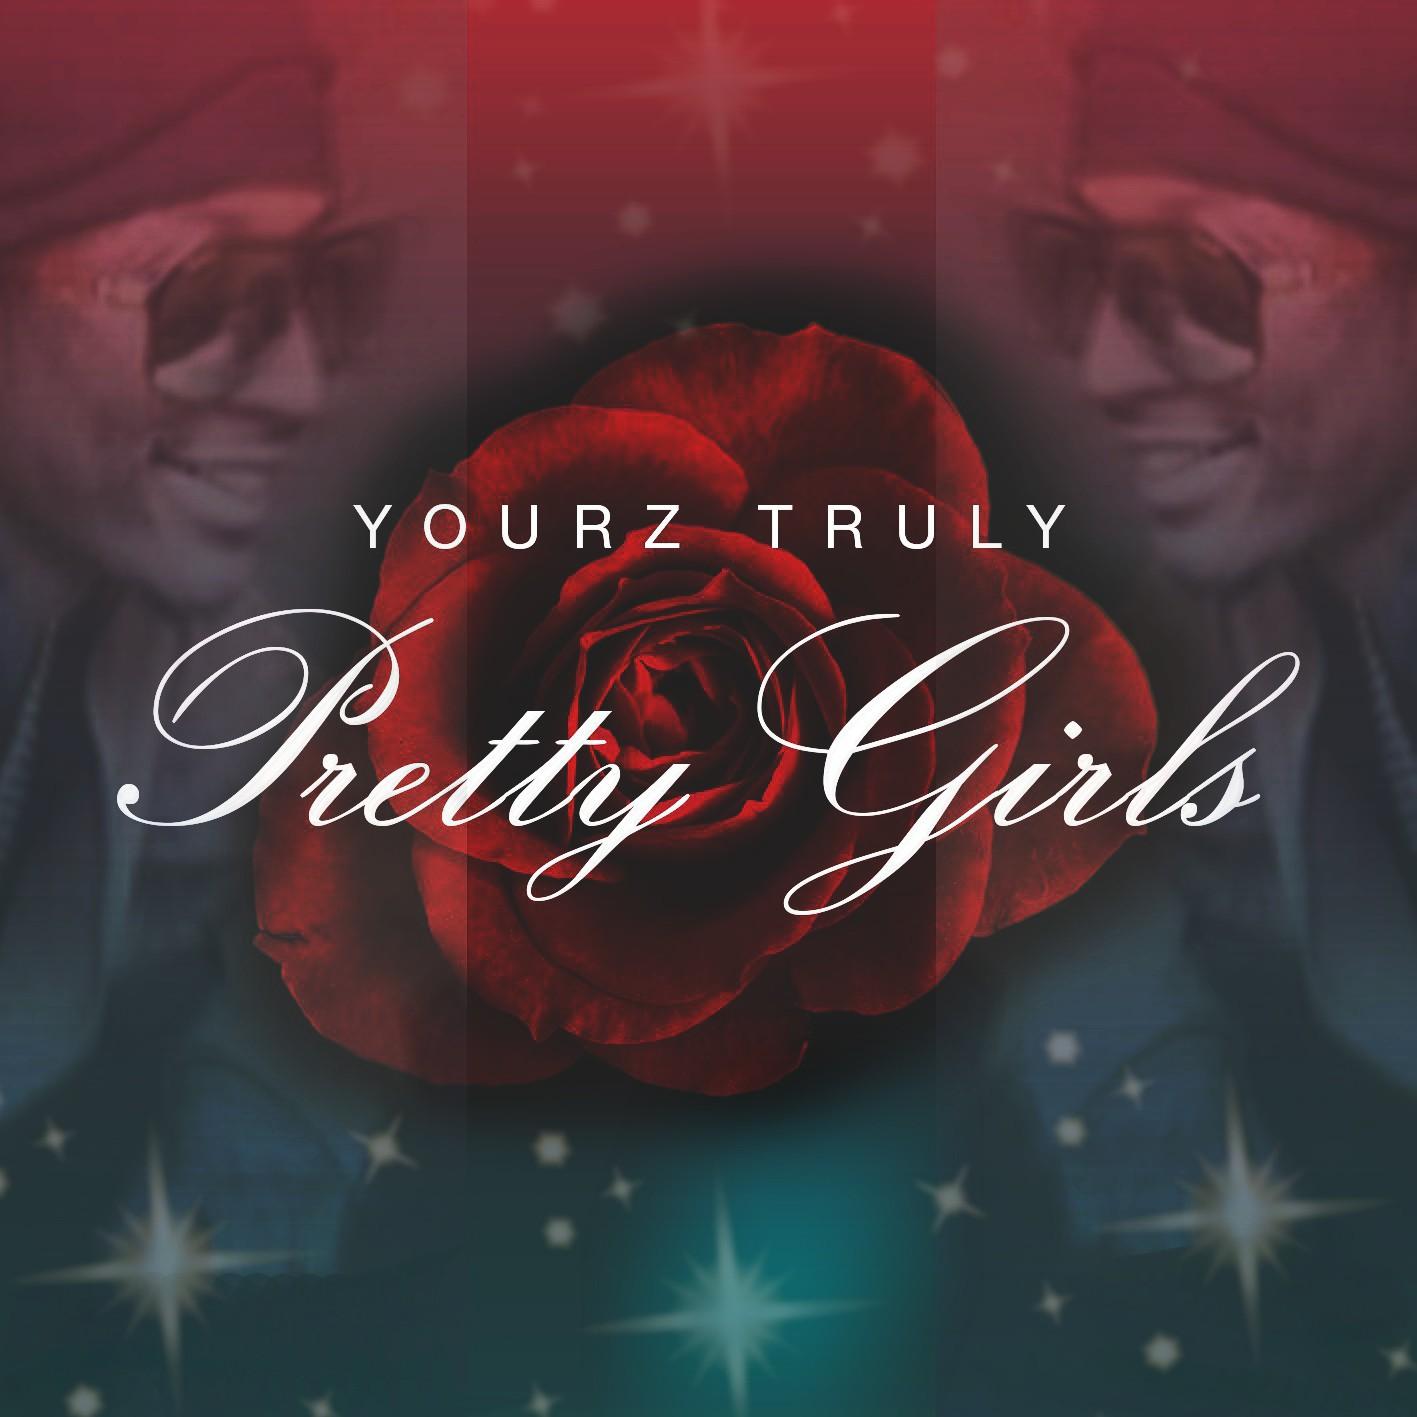 Yourz_Truly_Pretty_Girls_Single_Cover